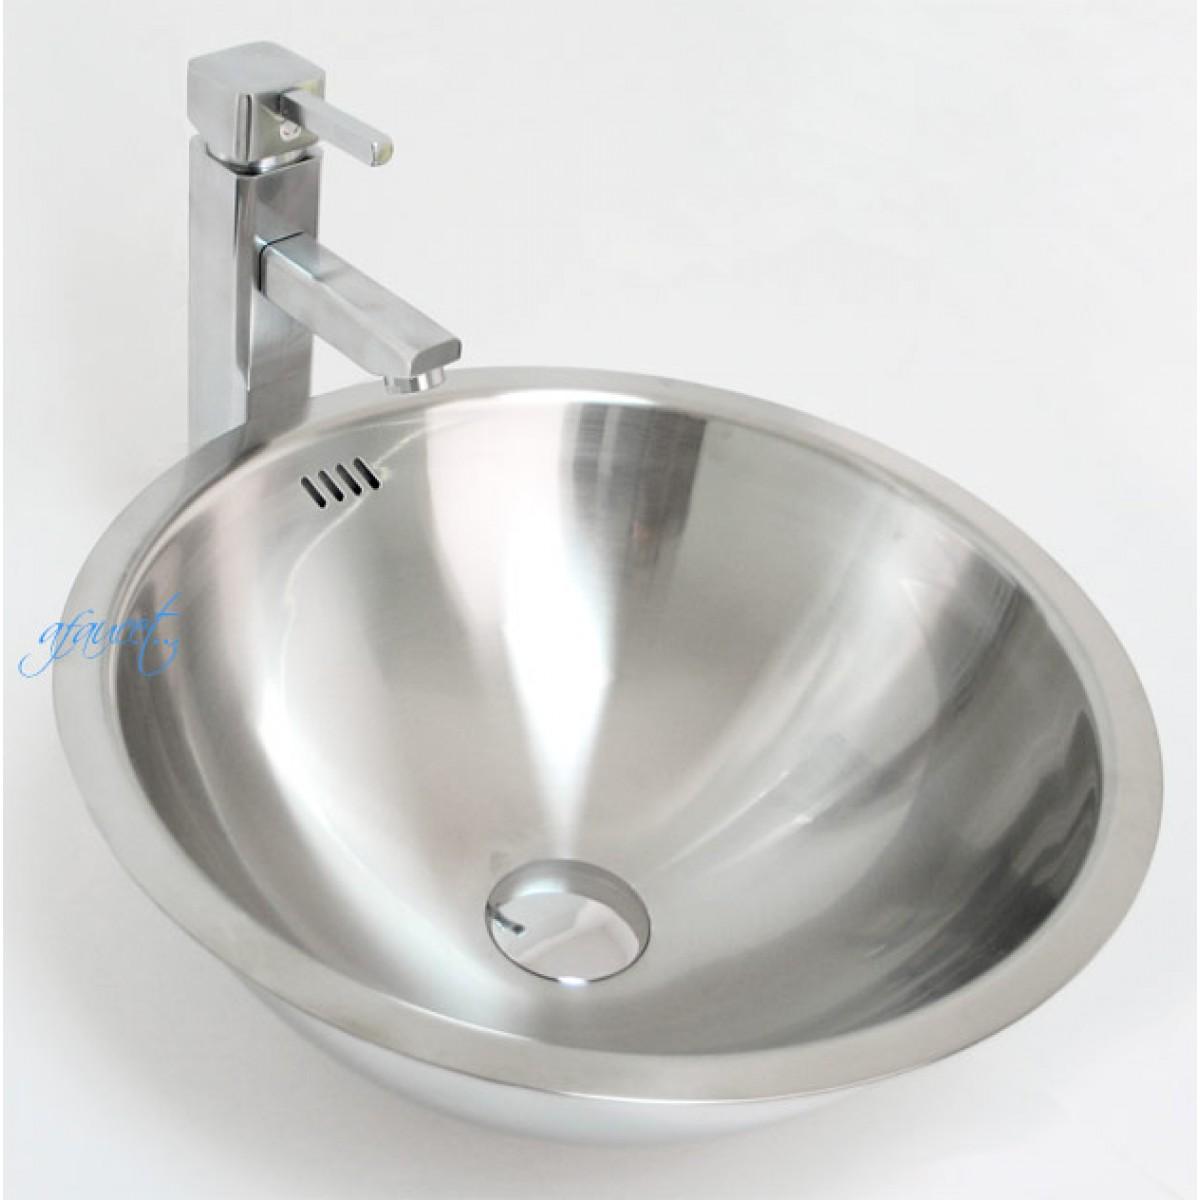 Round 18 gauge stainless steel drop in undermount countertop bathroom vessel sink 16 1 4 x Stainless steel bathroom vanities